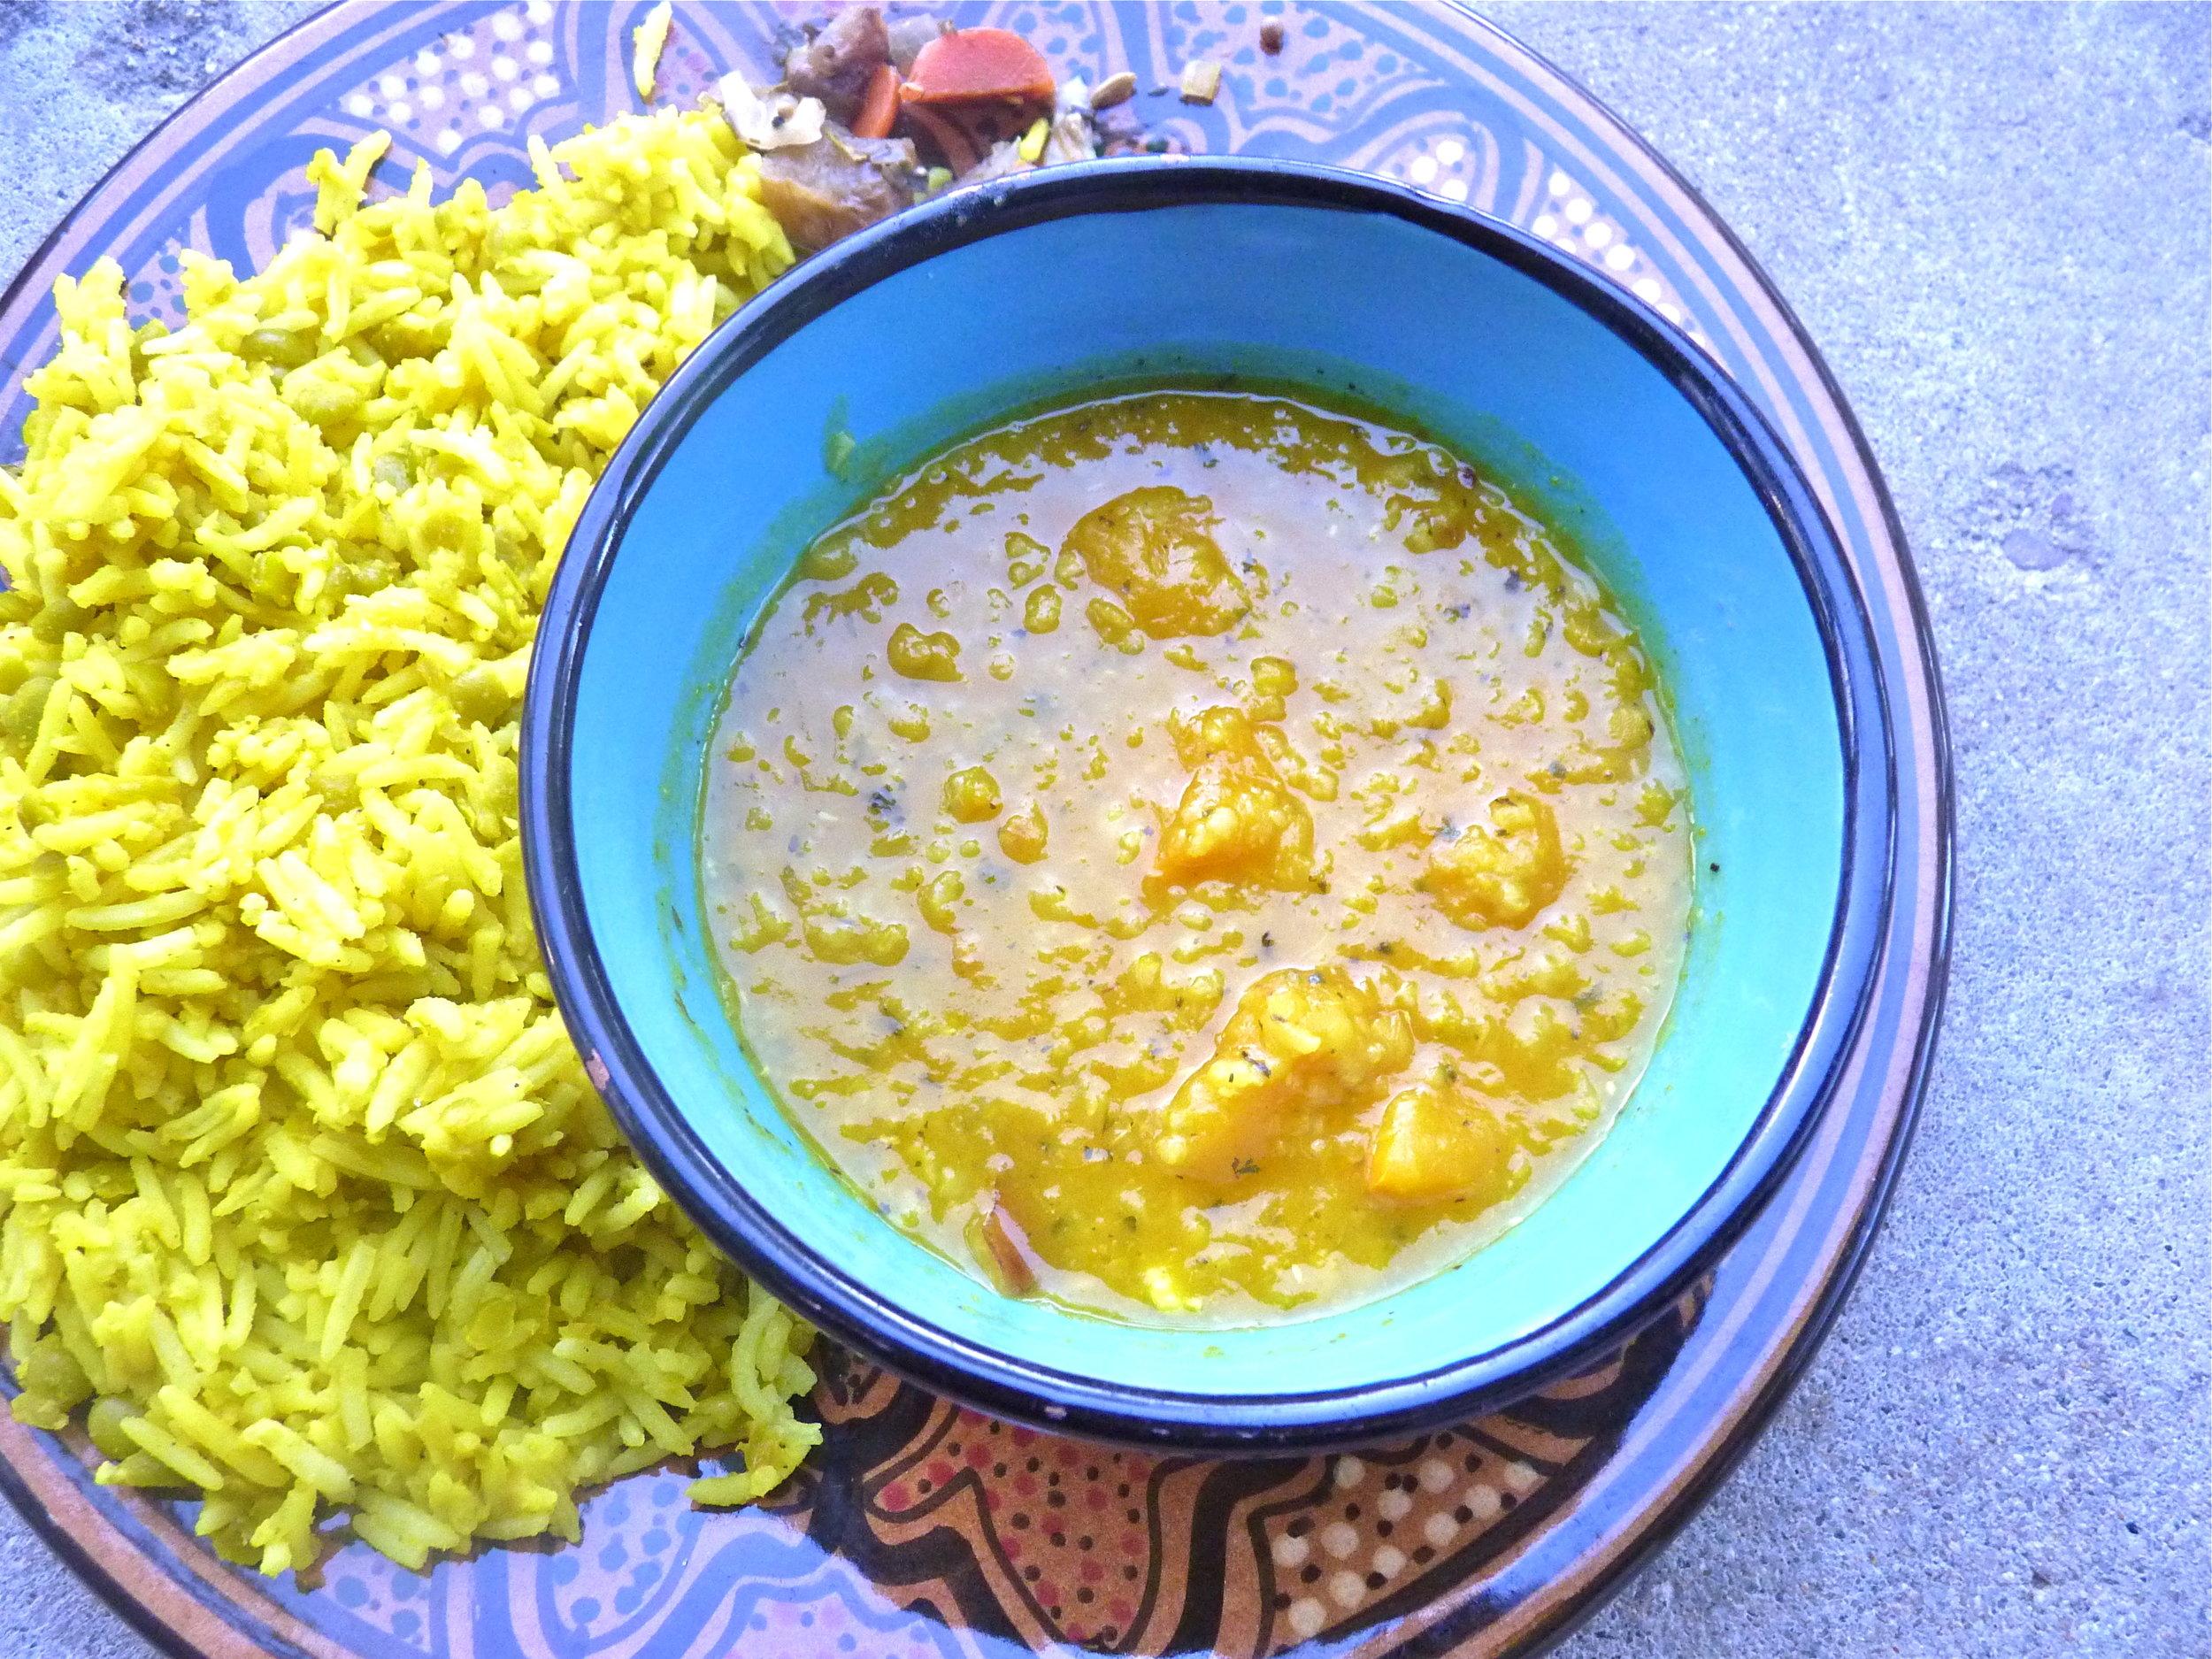 Ayurvedic Recipes_Persian Winter Squash Soup 3.jpg